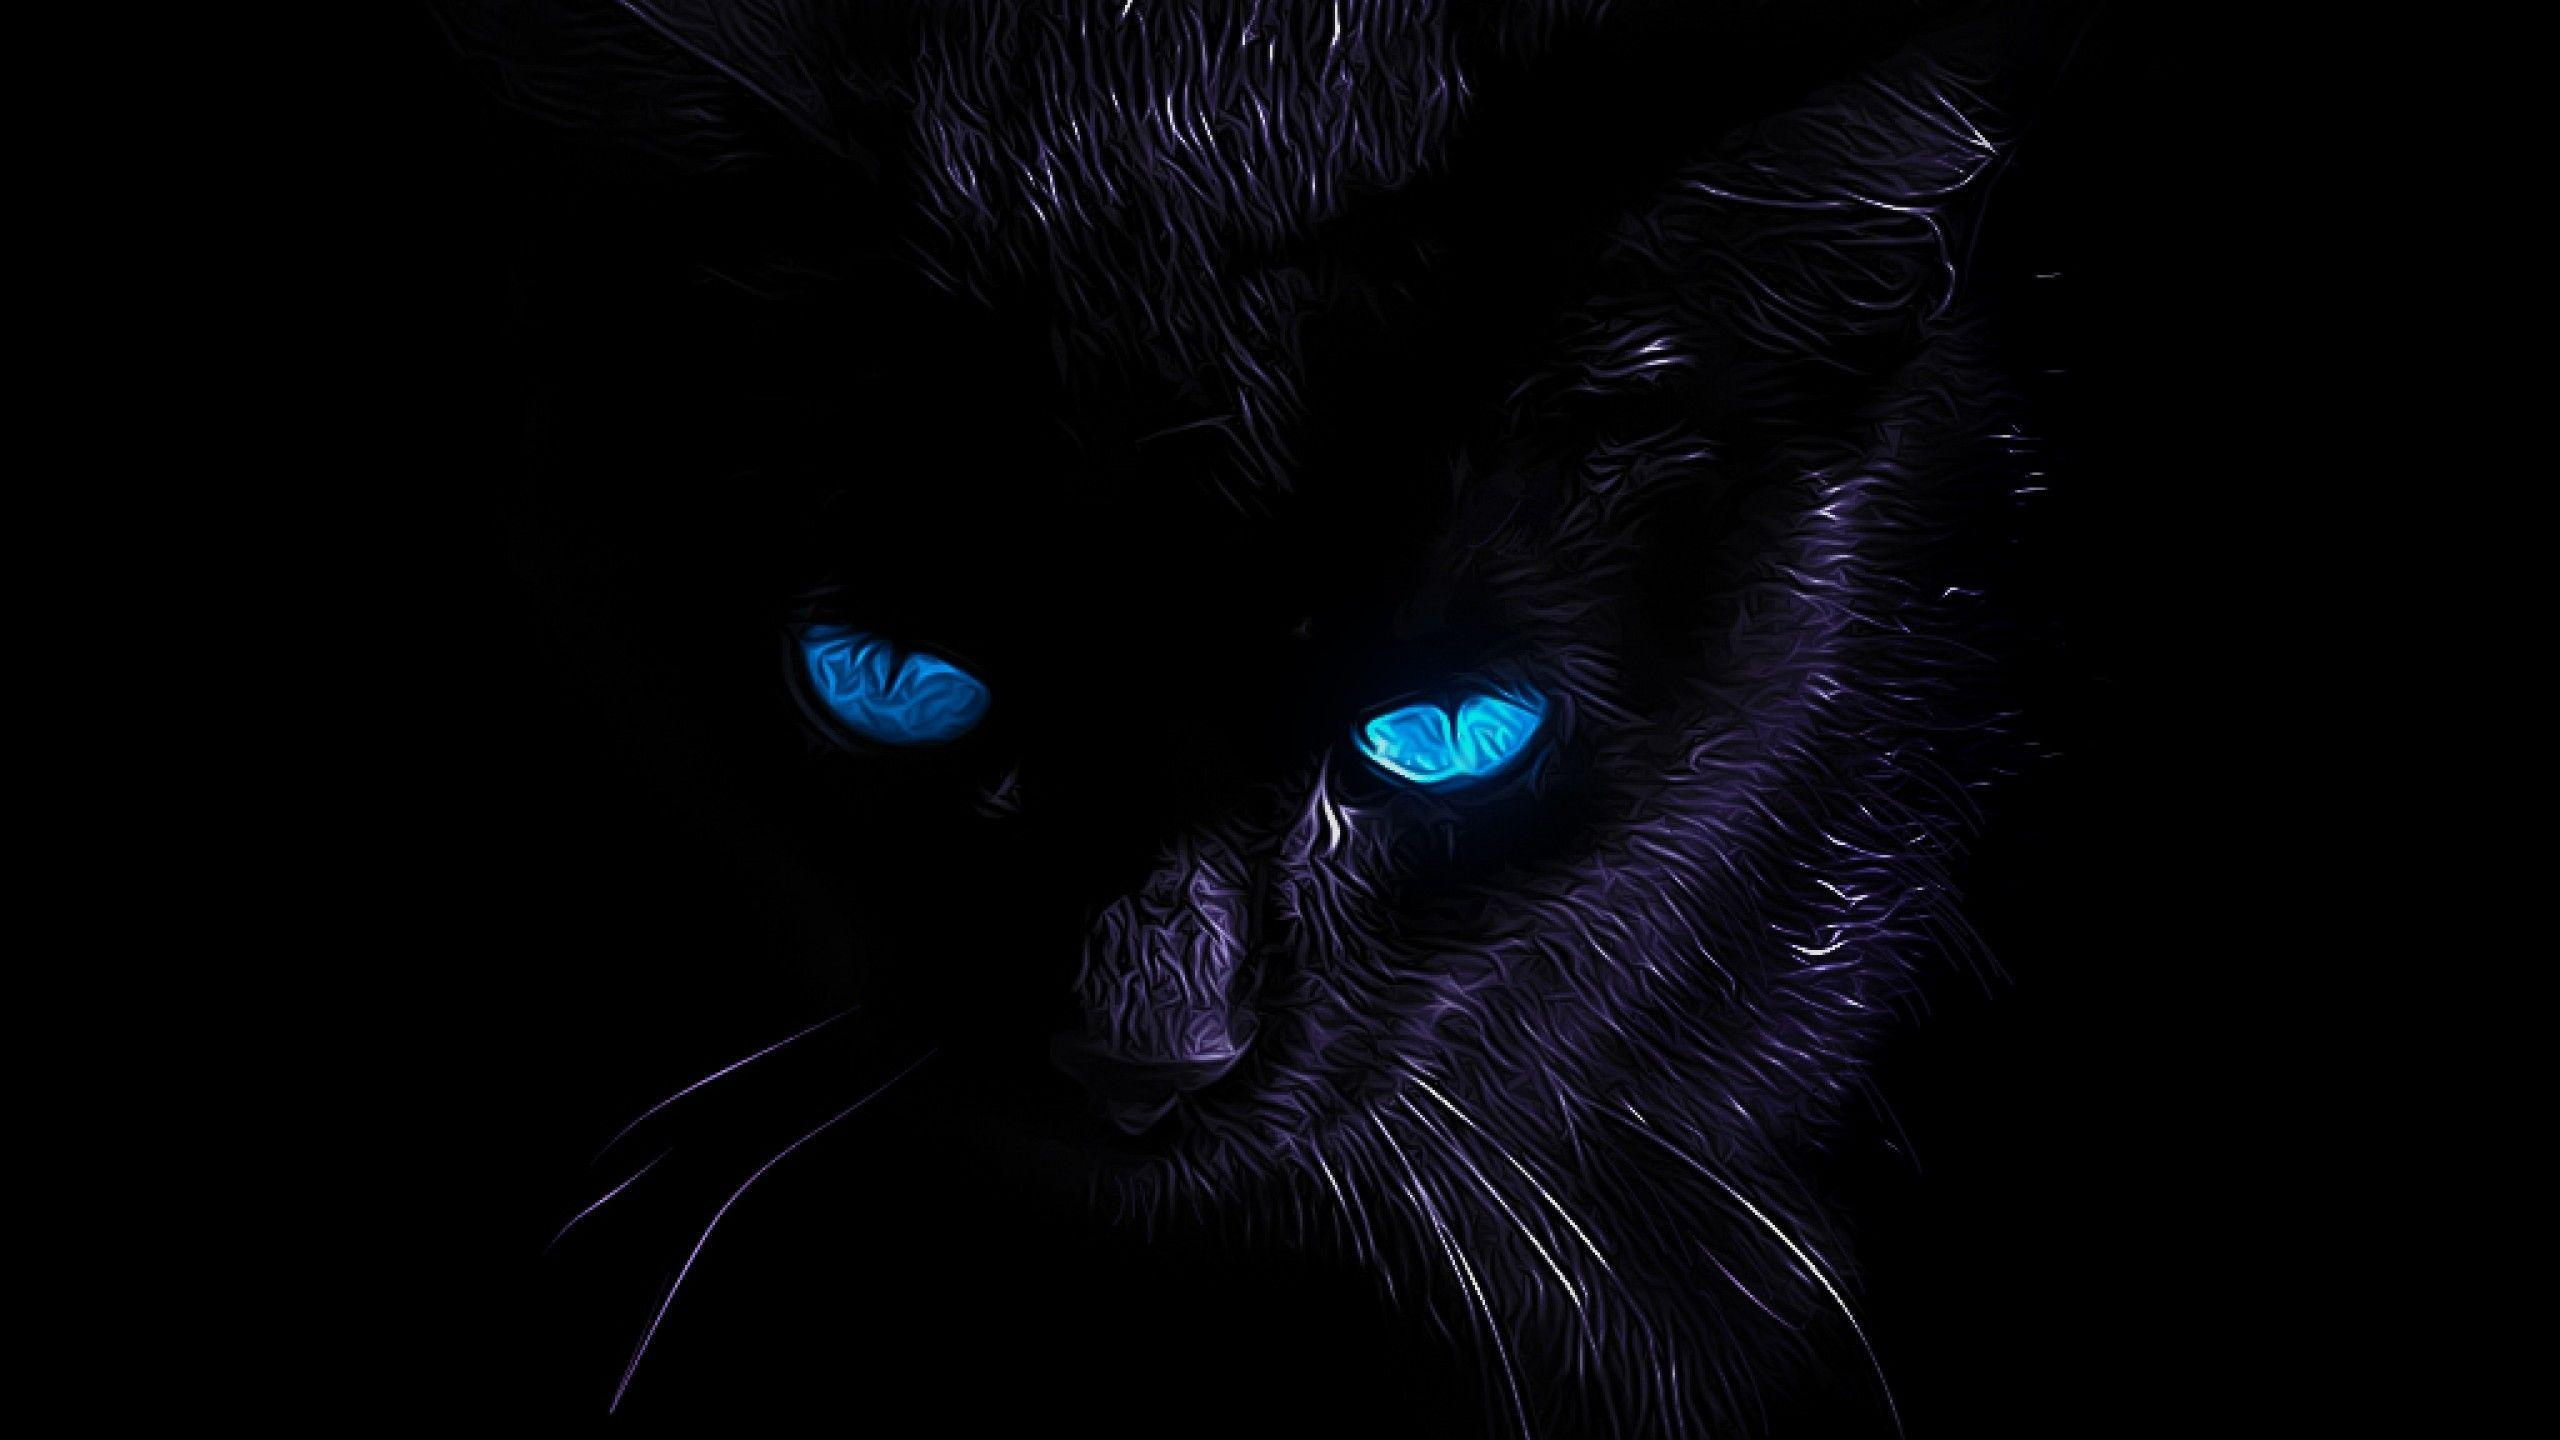 Black Cat Wallpapers - Wallpaper Cave